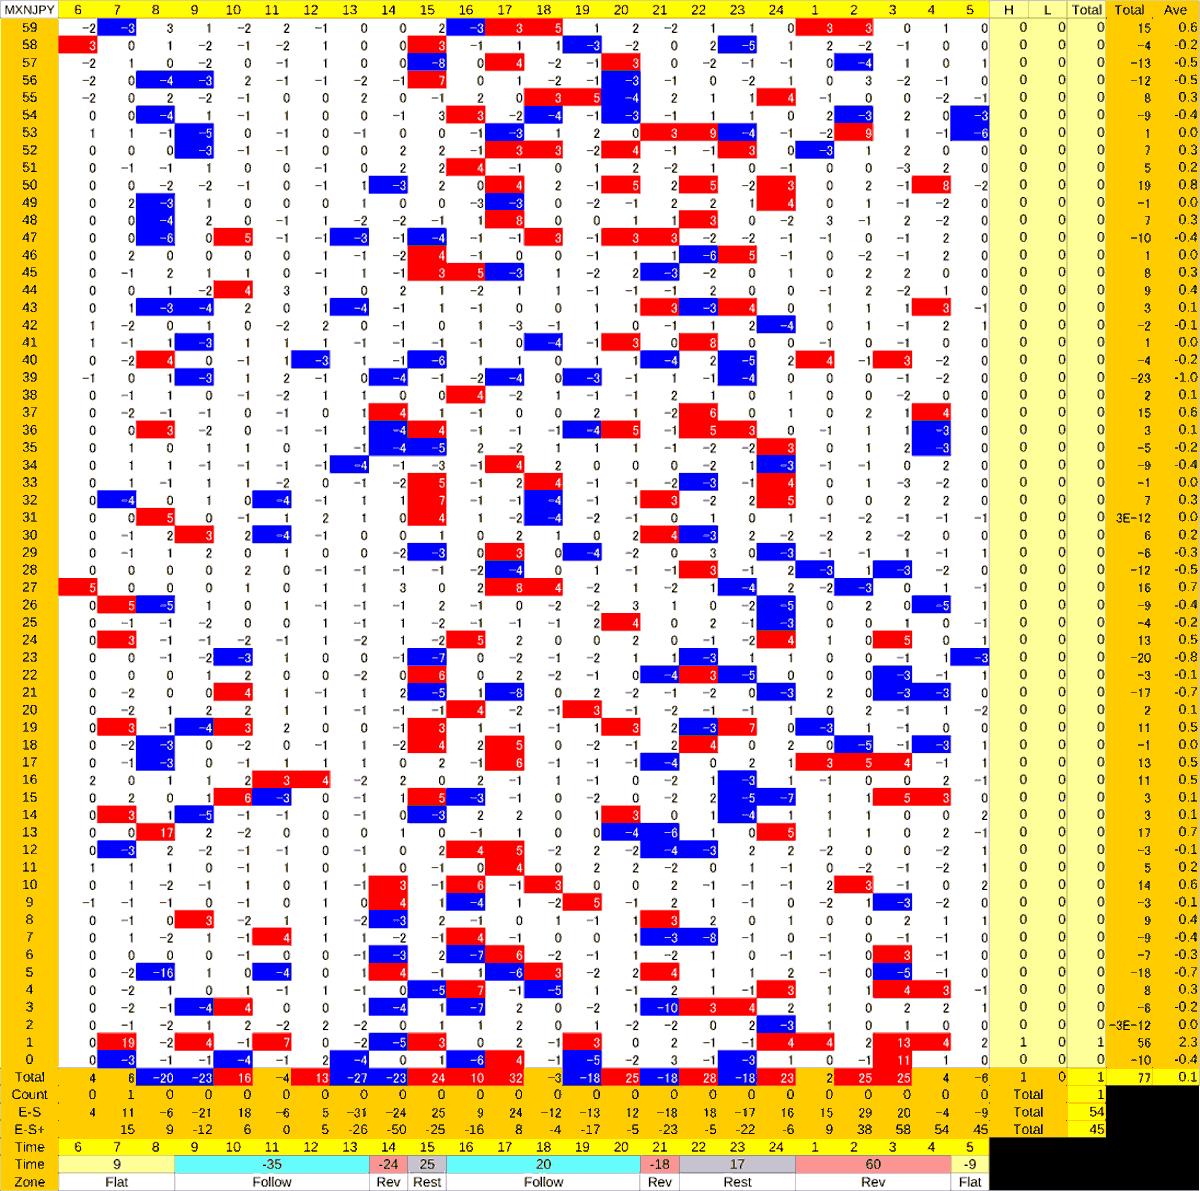 20200615_HS(3)MXNJPY